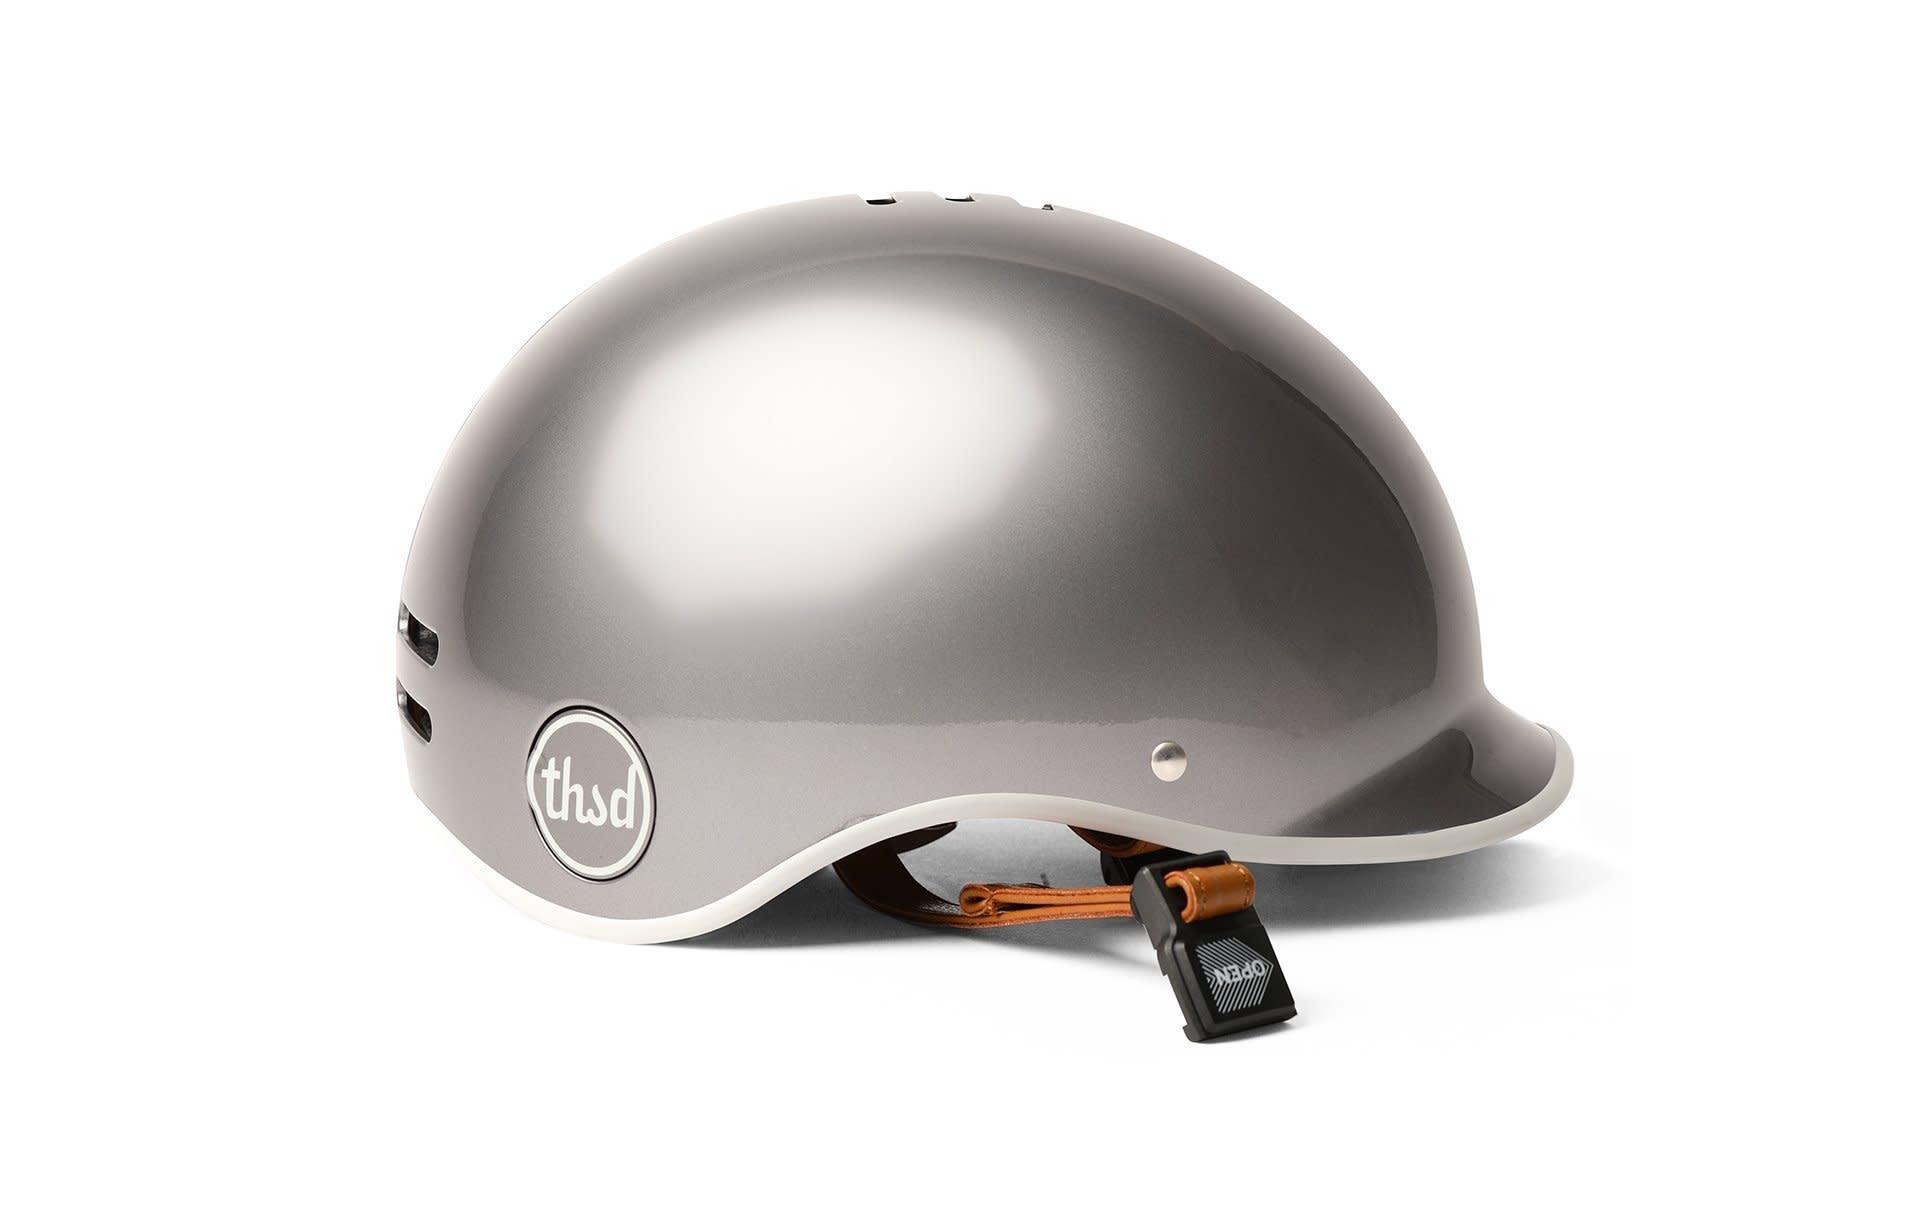 Thousand Helmet - Polished Titanium